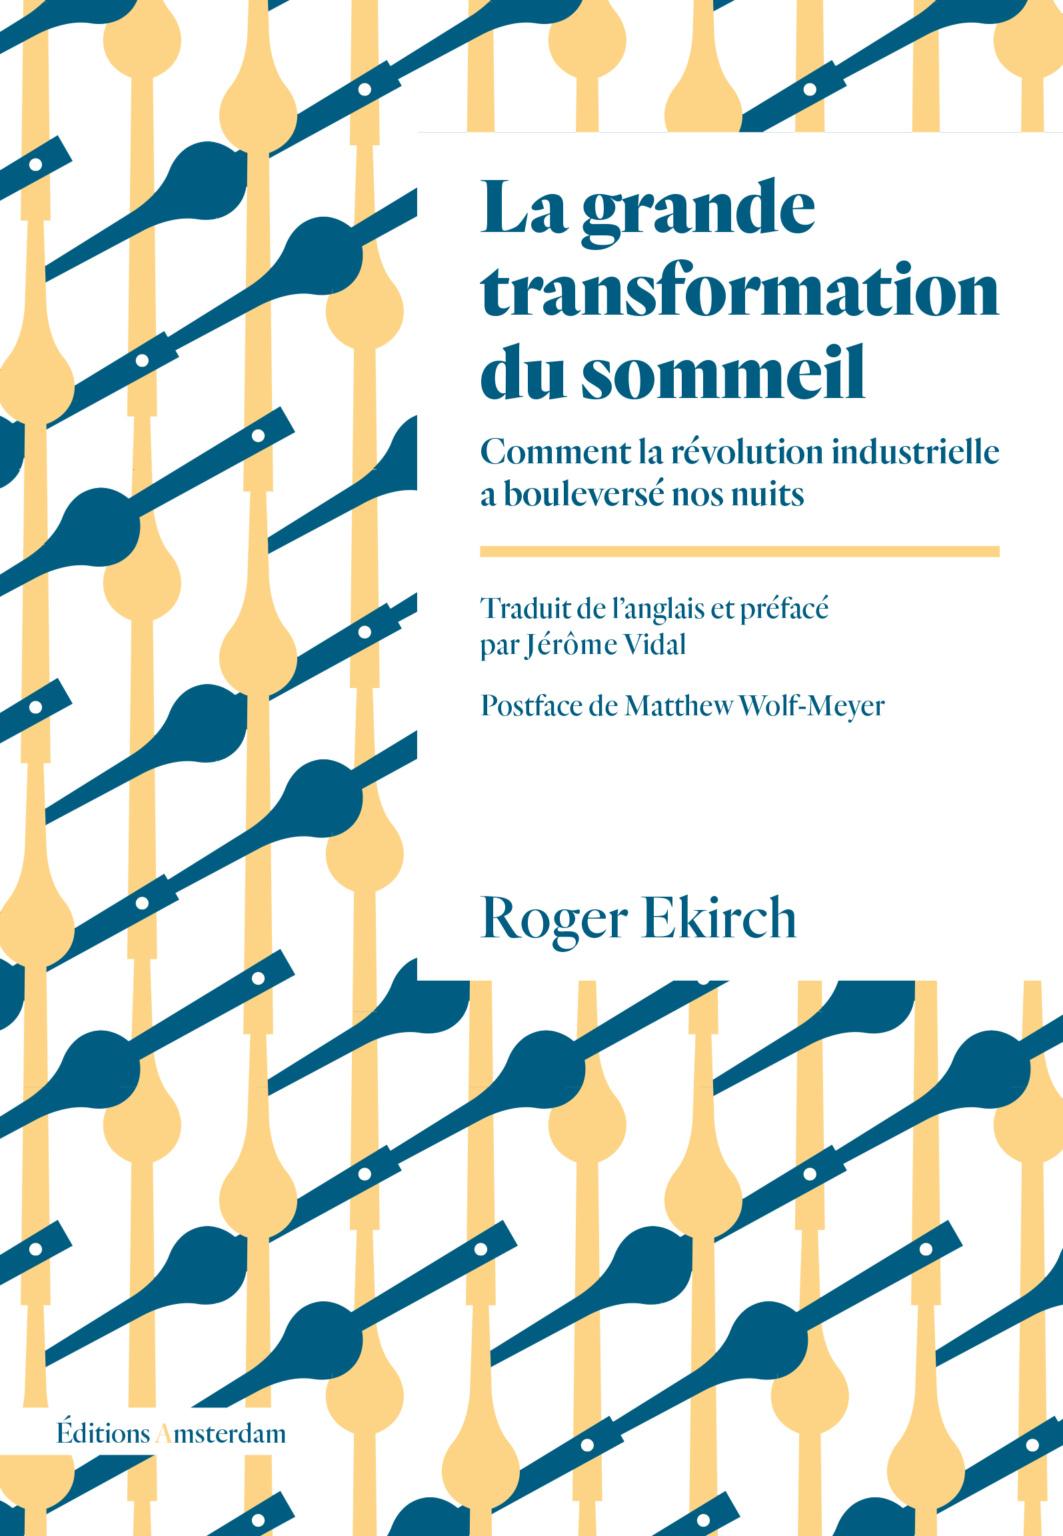 R. Ekirch, La Grande Transformation du sommeil